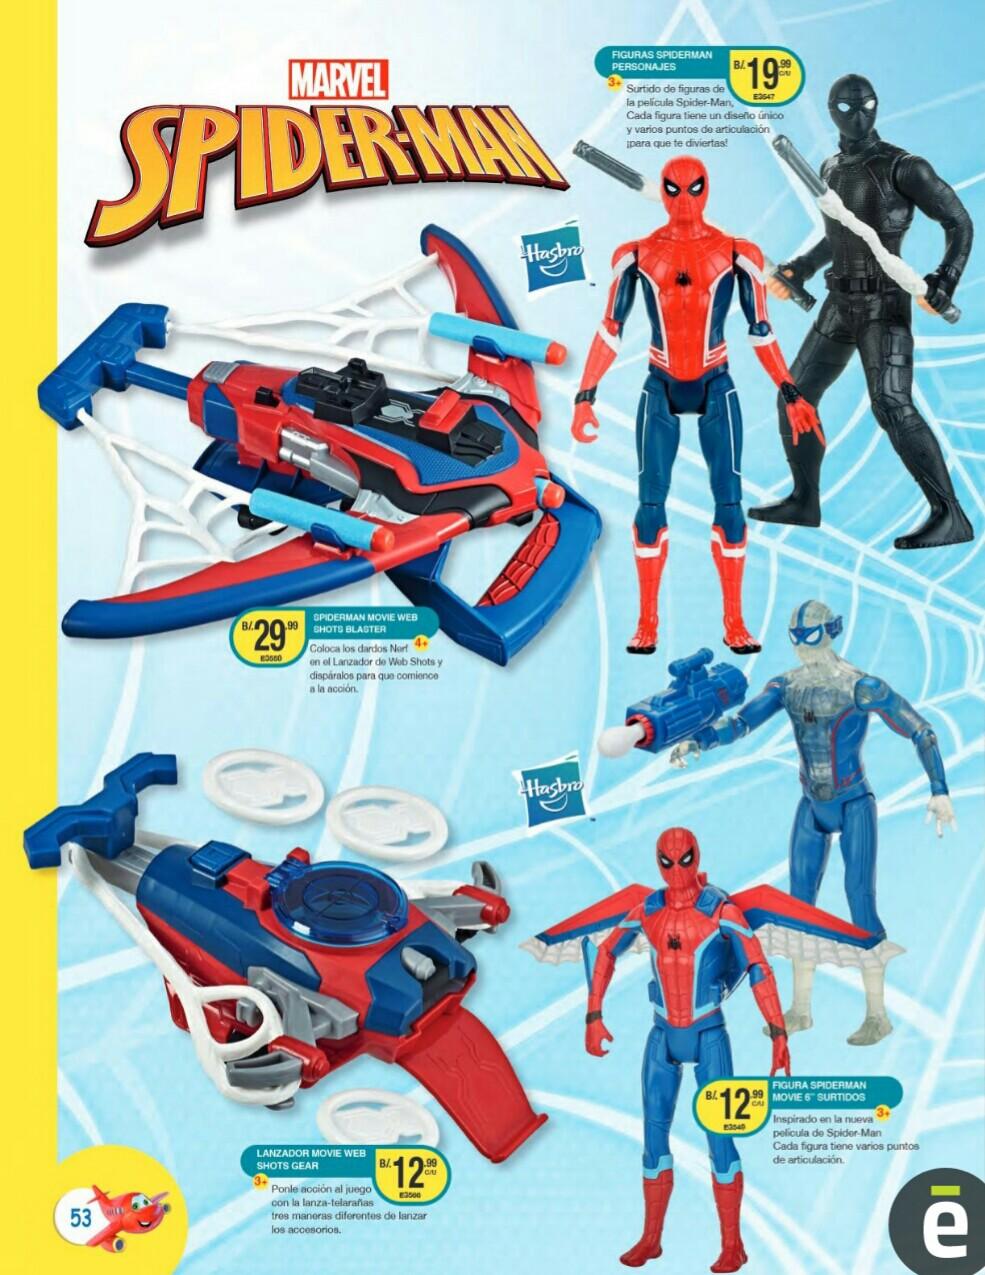 Catalogo juguetes Titan Toys 2019 p53